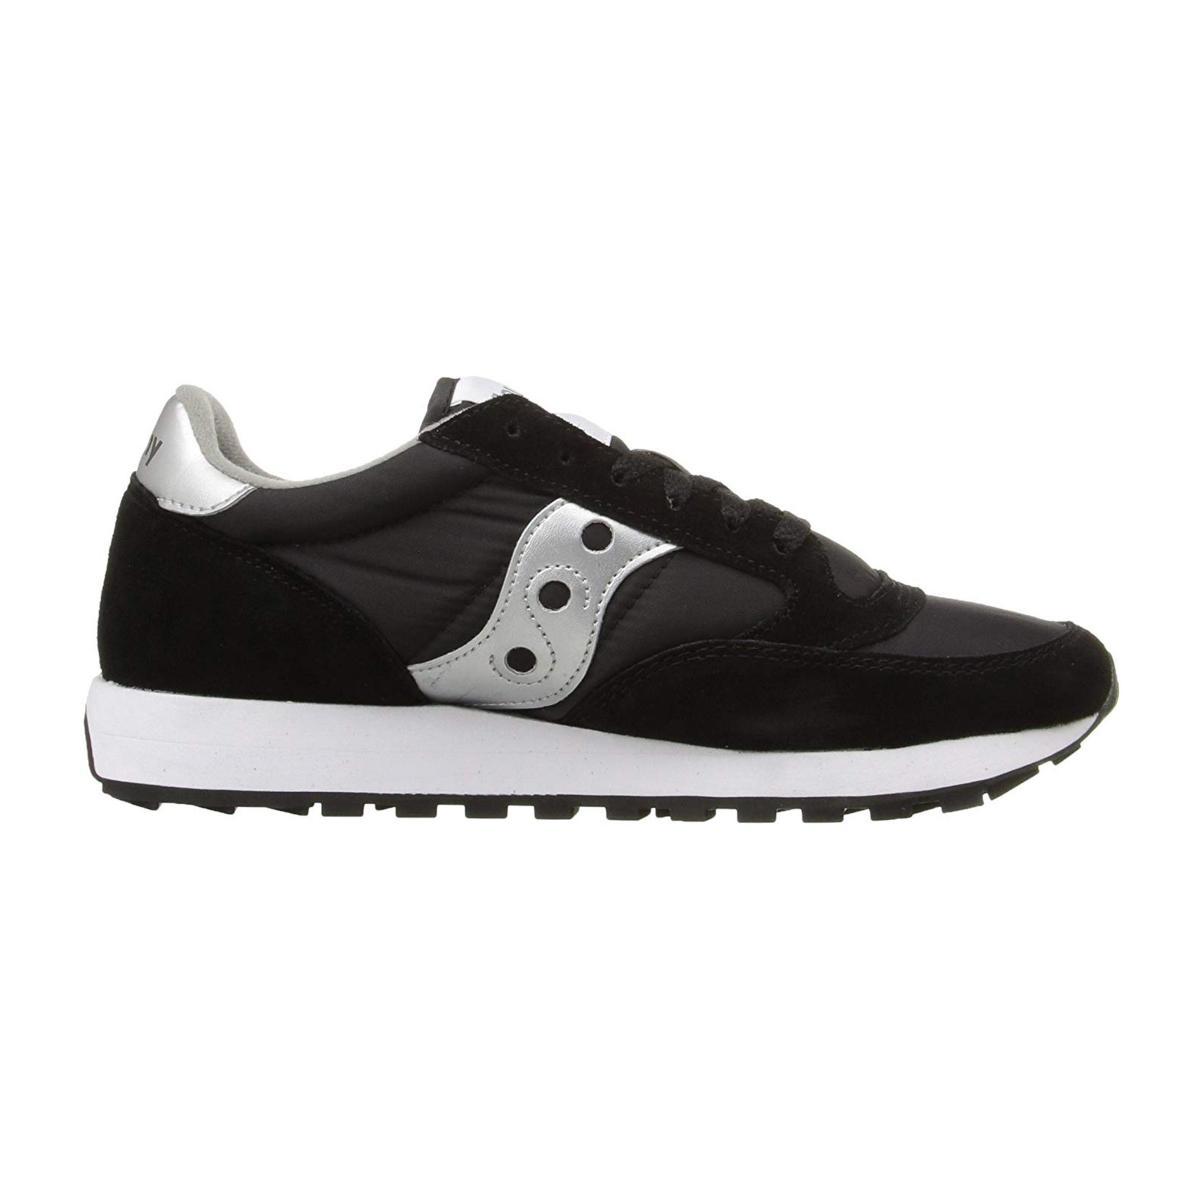 Scarpe Sneakers Saucony Jazz Original Uomo rif. 2044-1